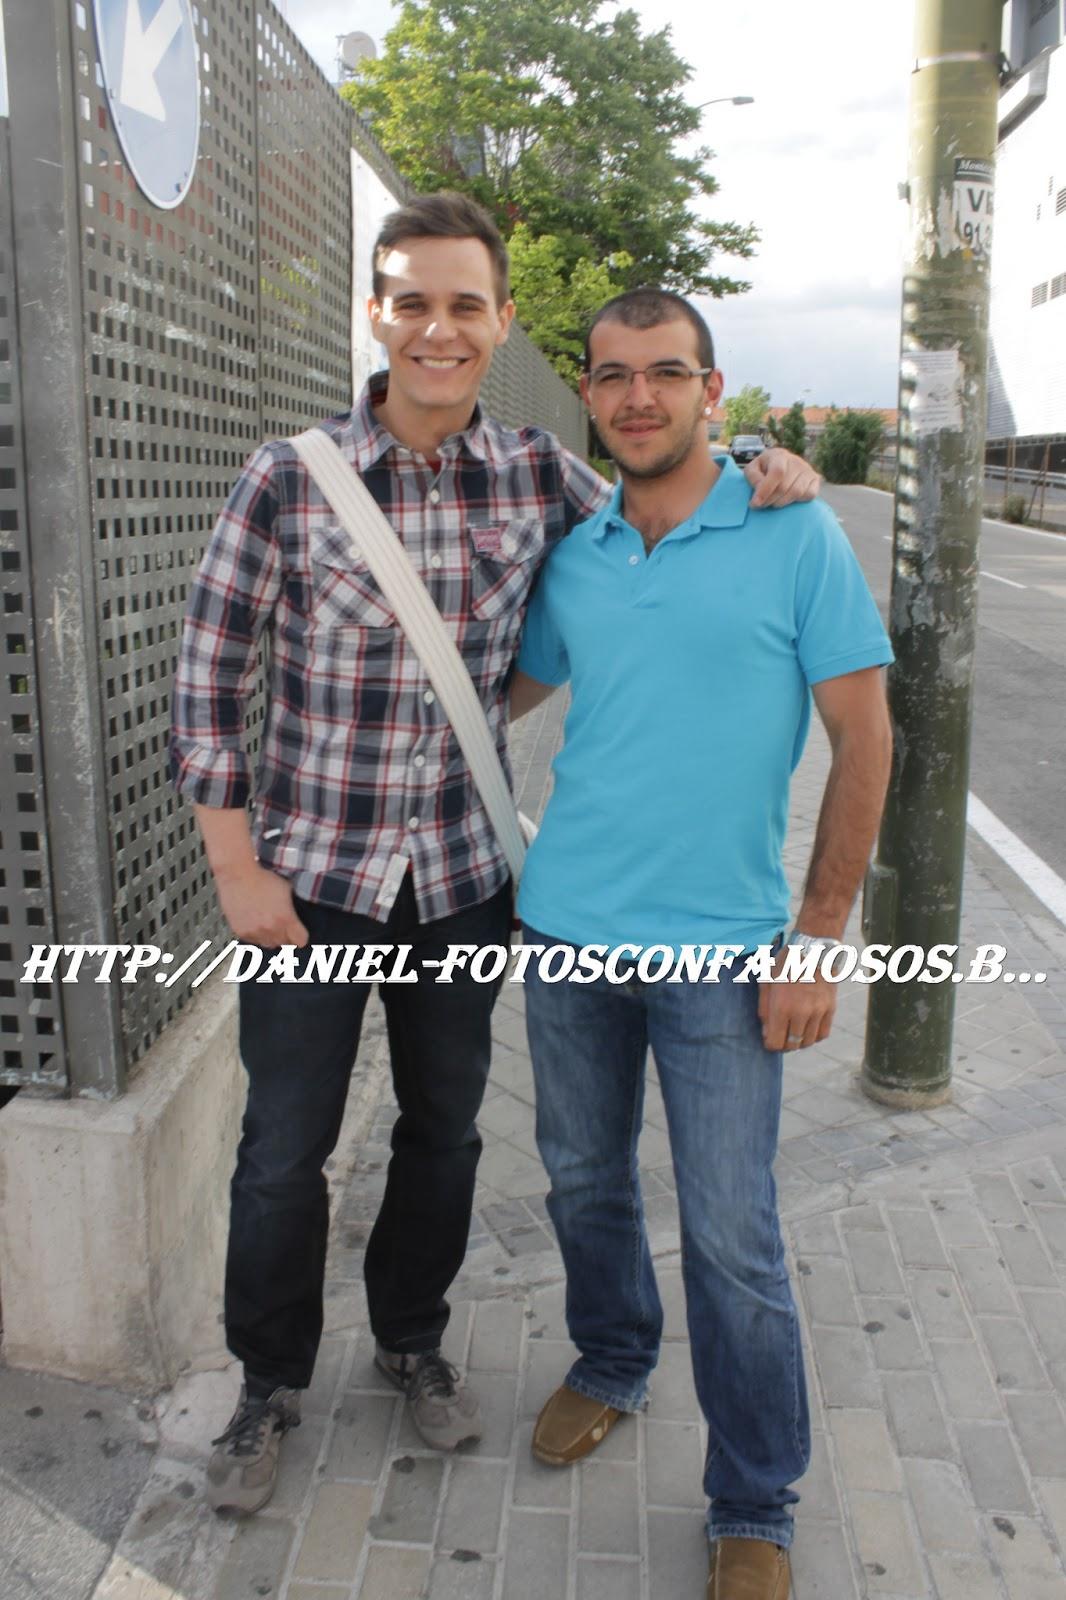 ¿Cuánto mide Christian Gálvez? Cristian+Galvez